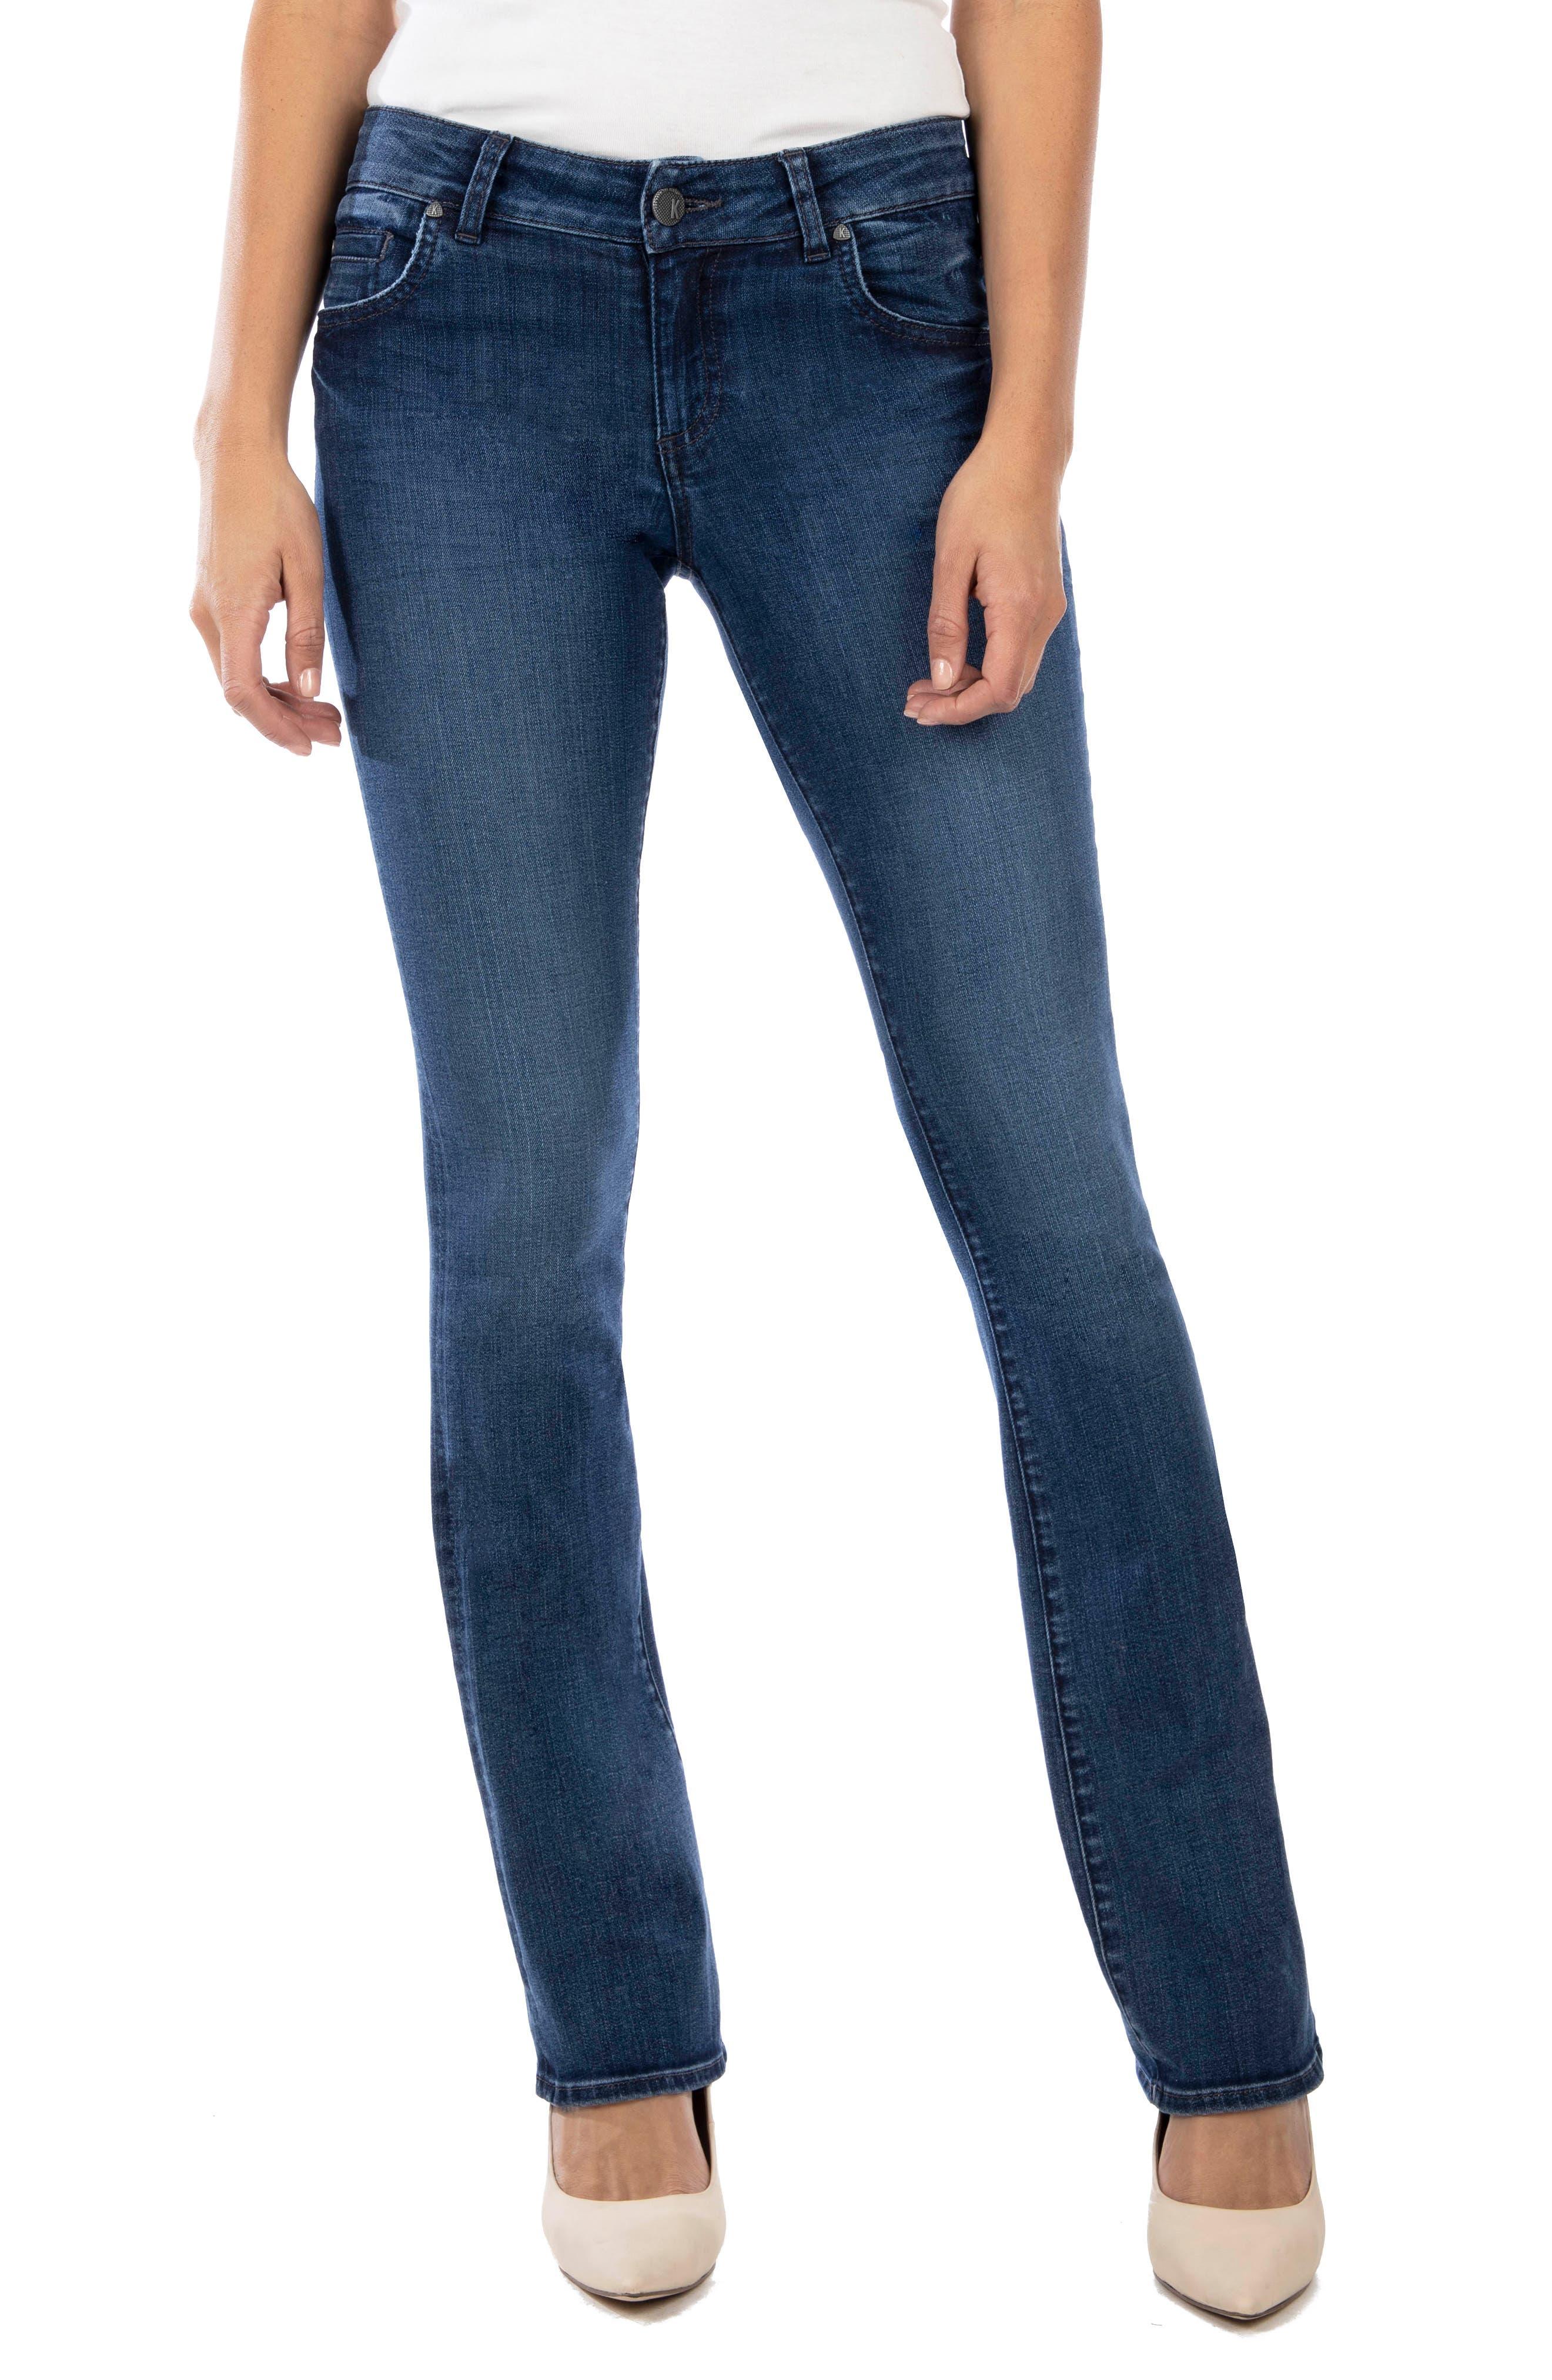 KUT from the Kloth Natalie High Waist Bootcut Jeans (Doer)